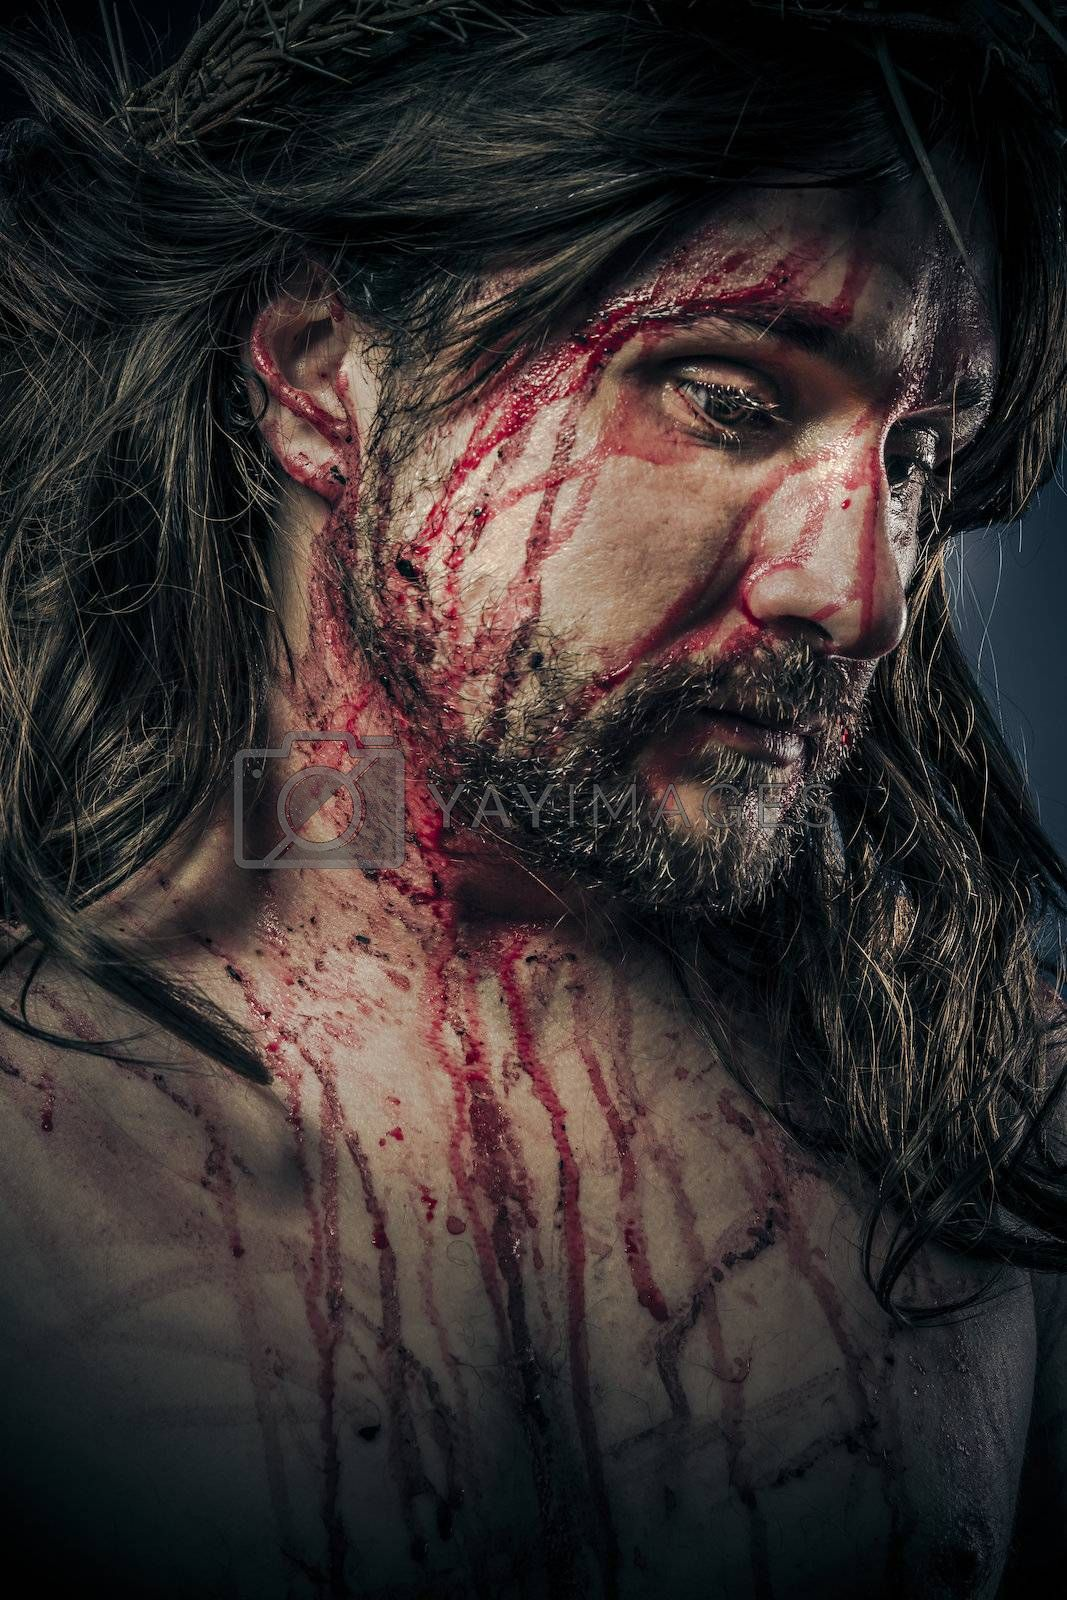 Christianity, viacrucis concept, religion picture